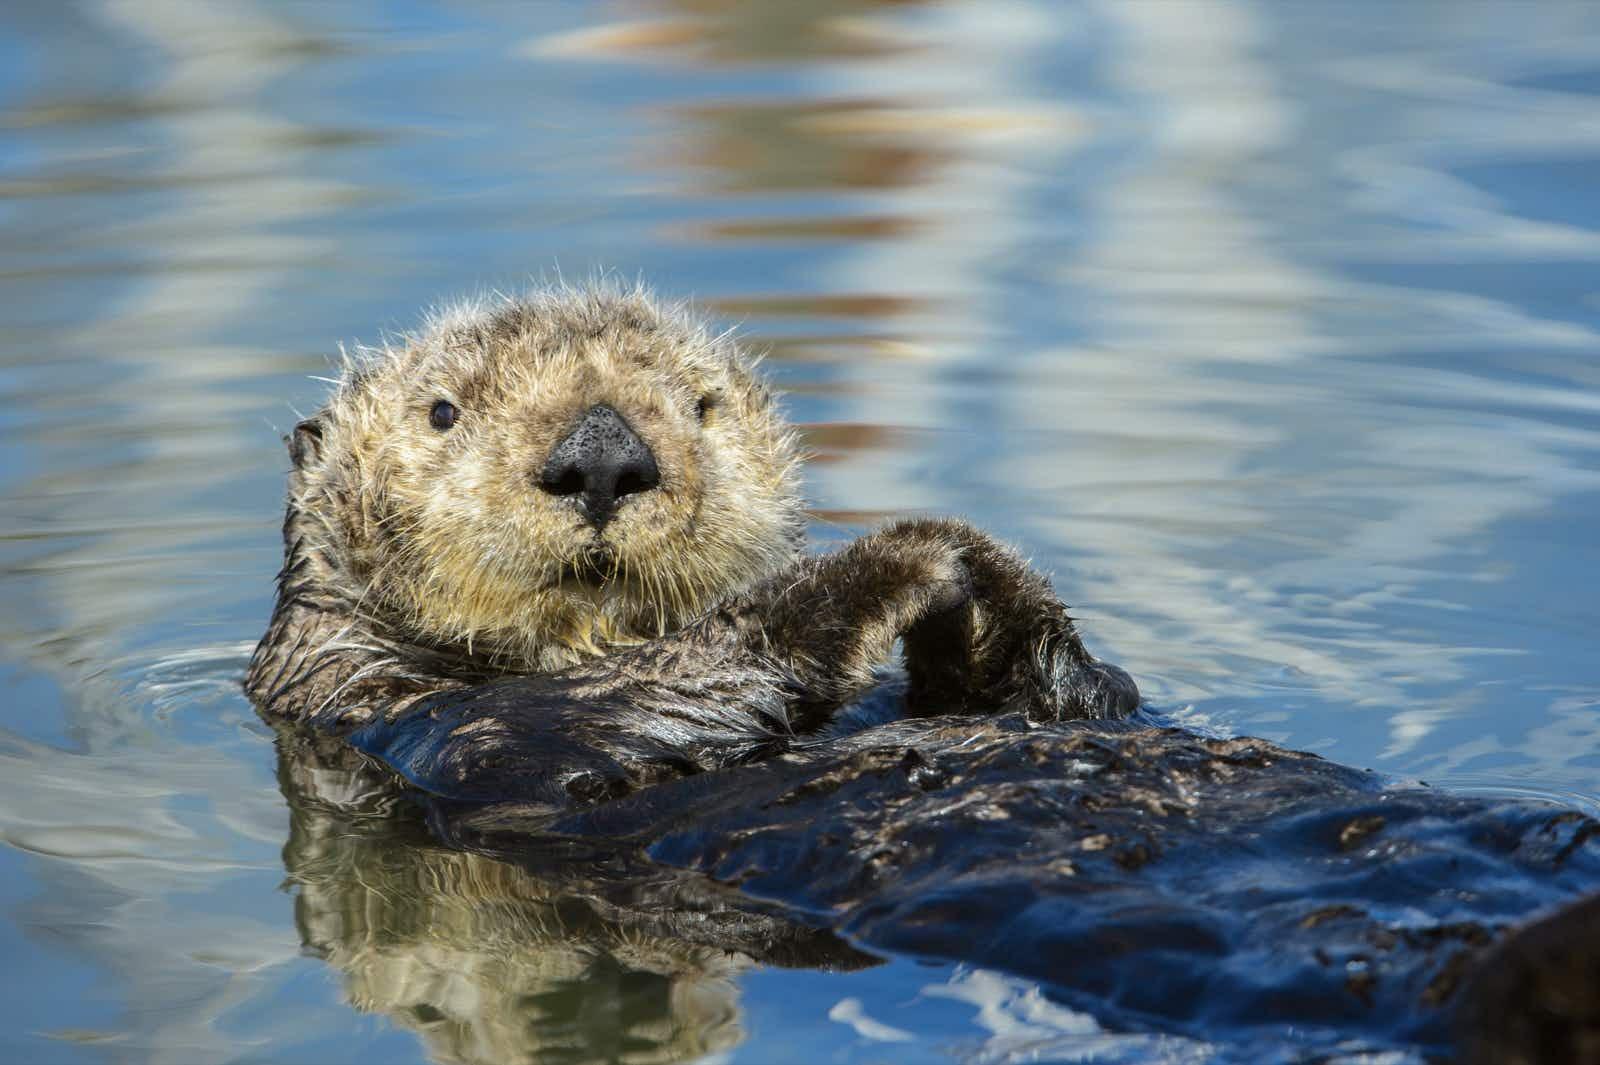 Watching wildlife along California's coast